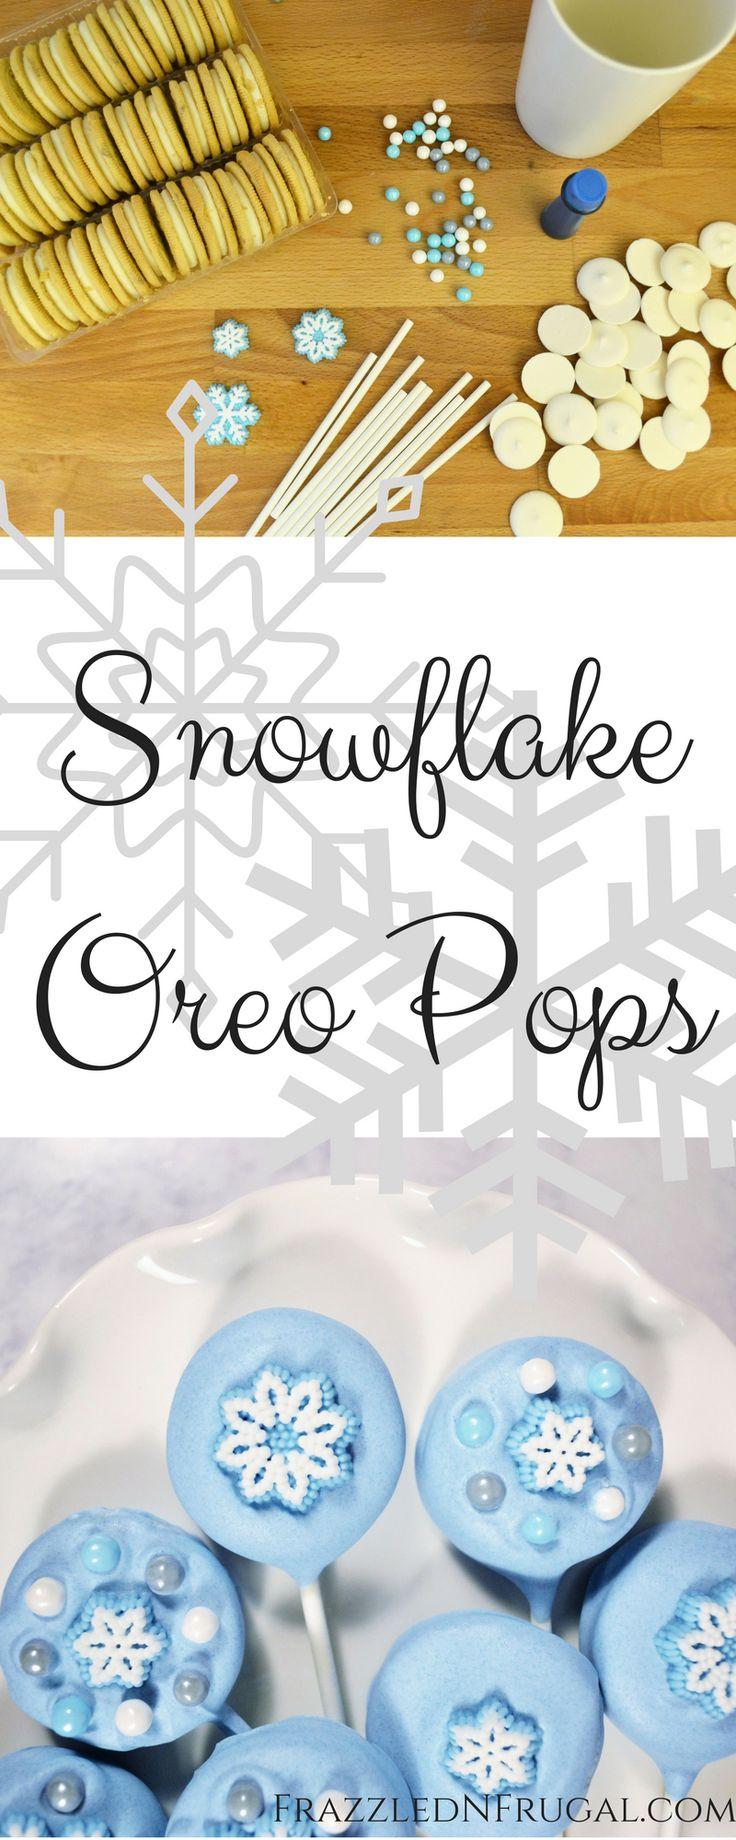 Snowflake Oreo Pops